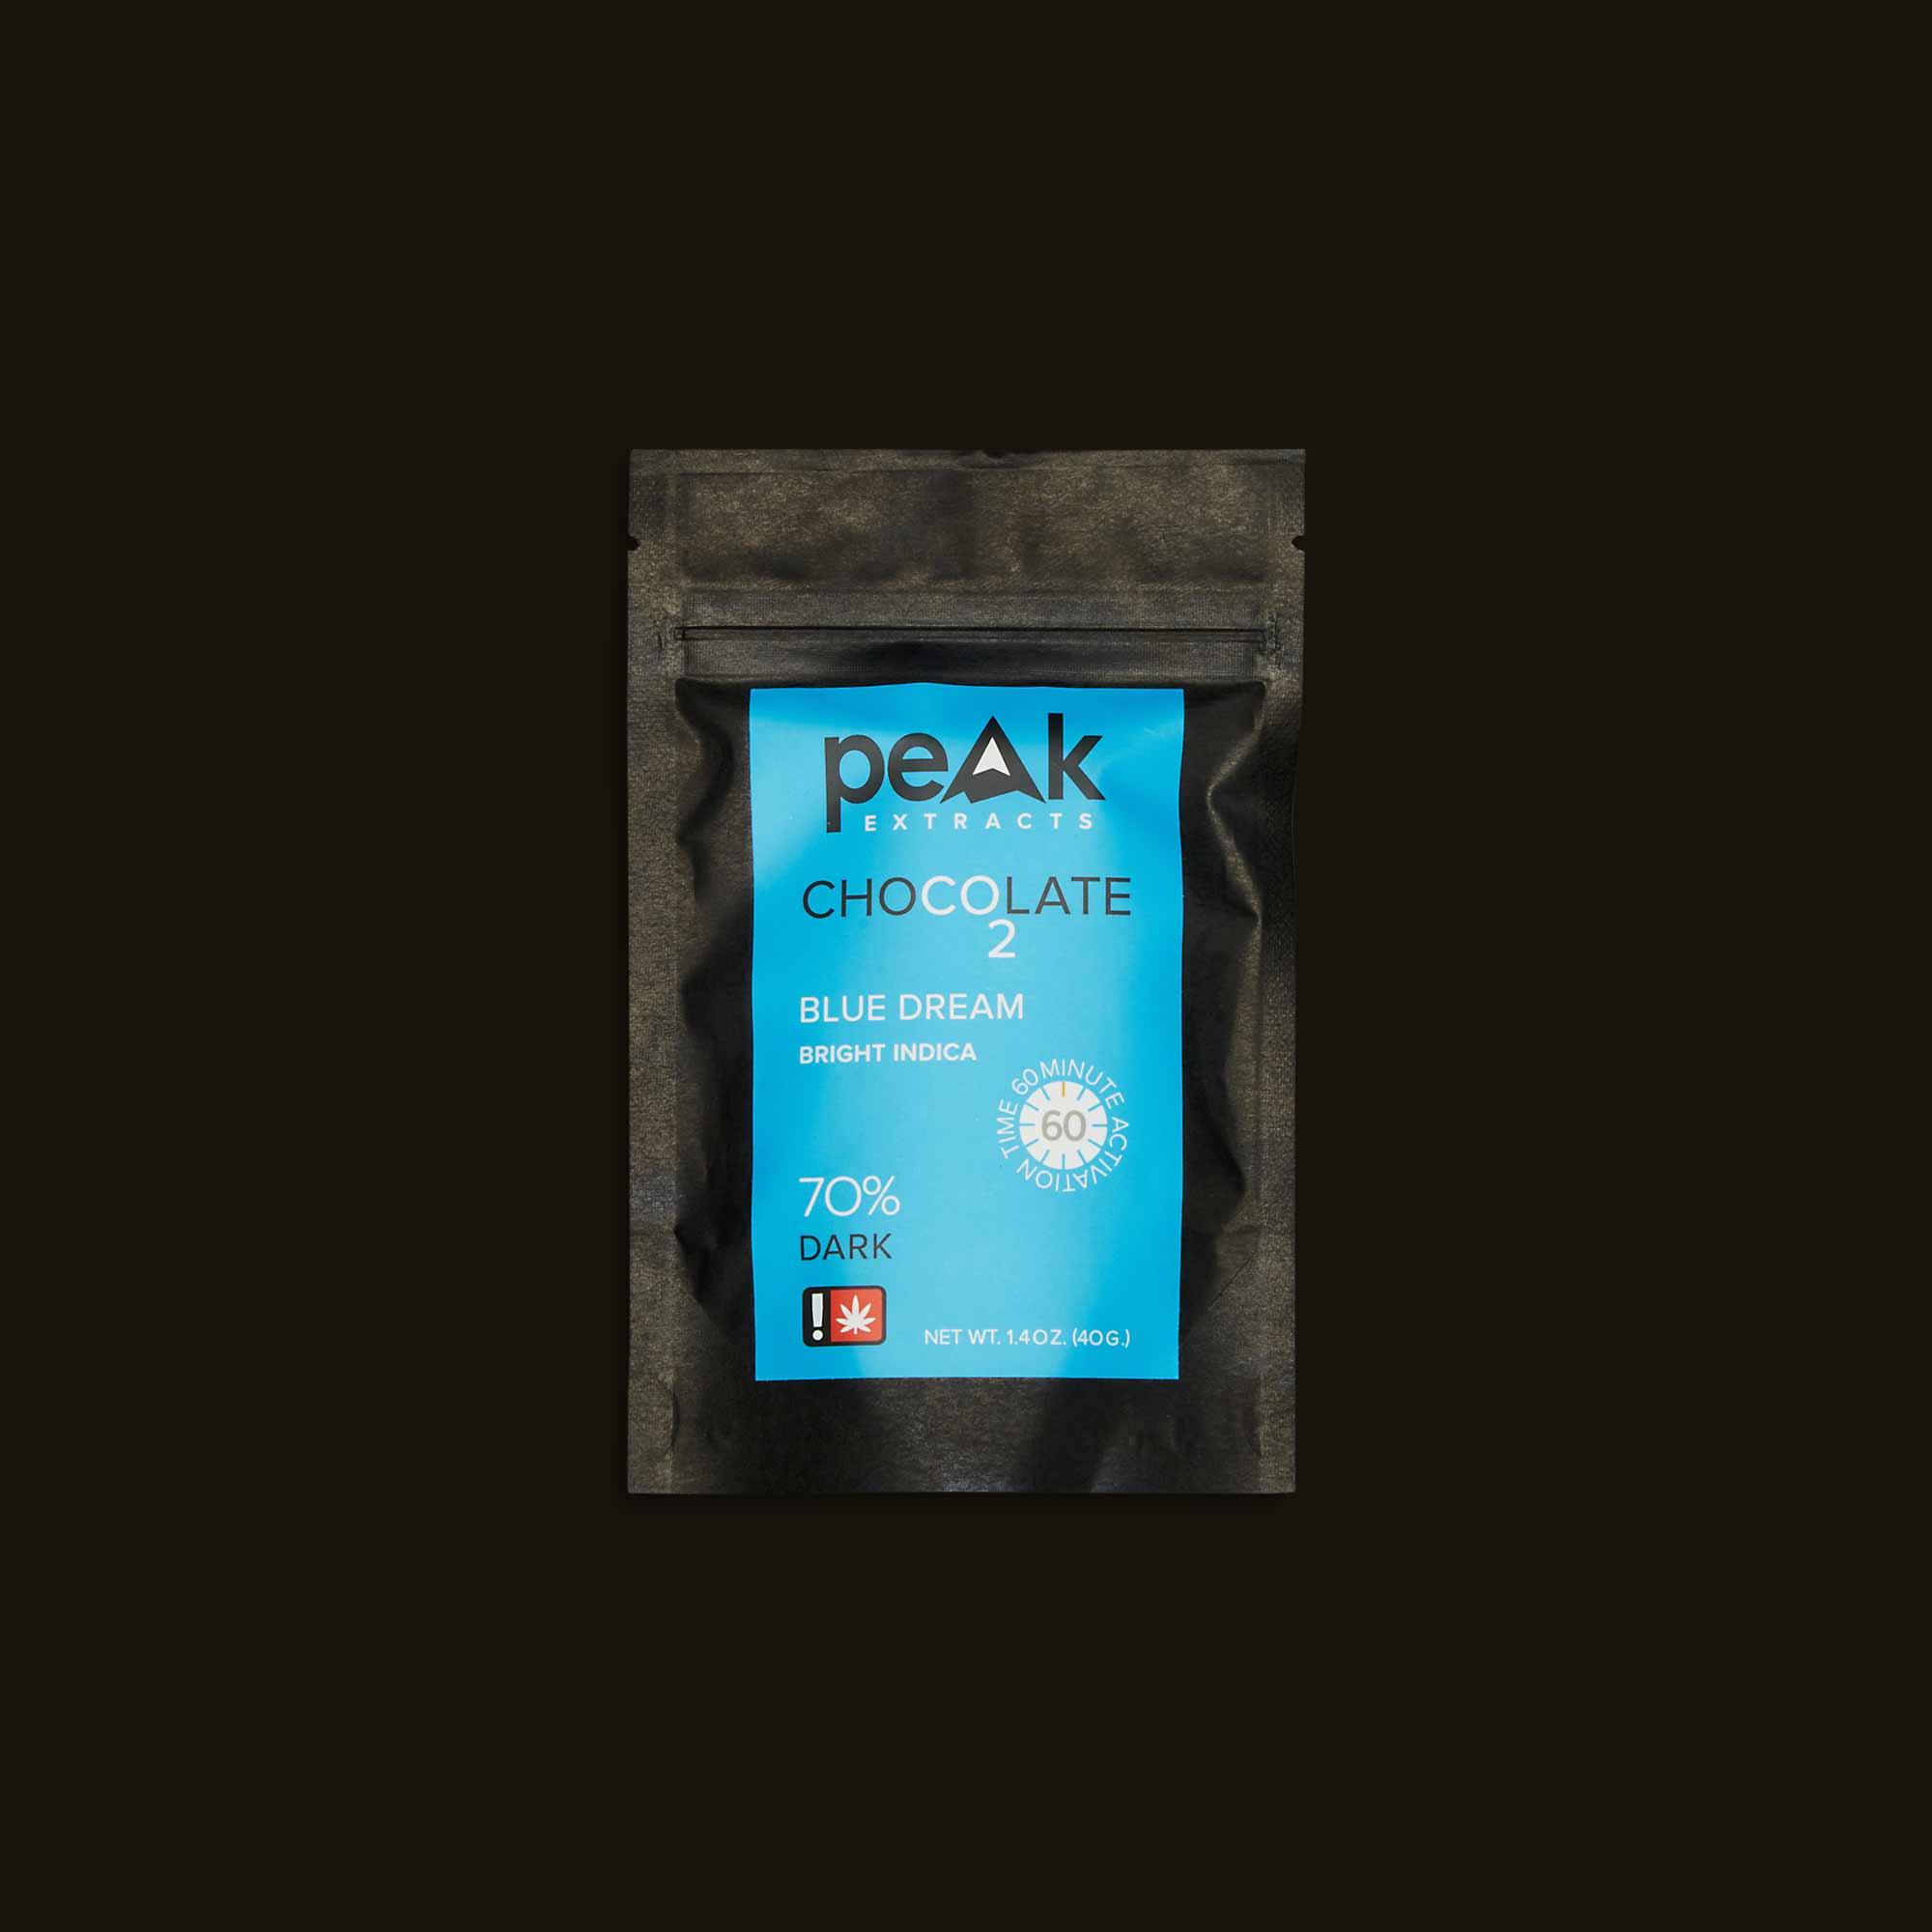 Peak Extracts Blue Dream Chocolate Bar